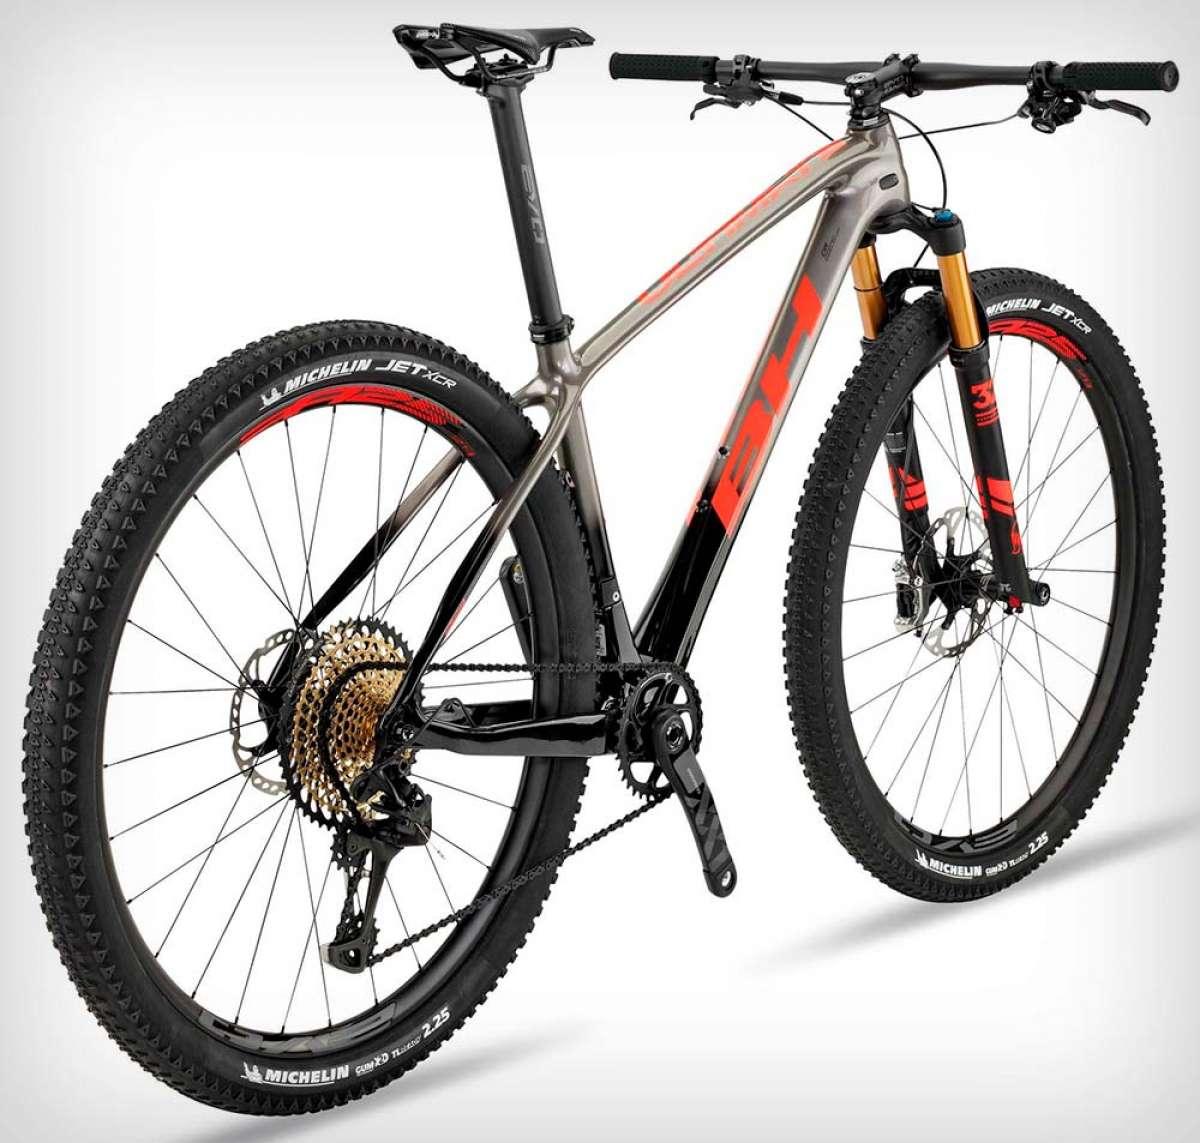 Topes de gama para XC/Maratón: BH Lynx Race EVO Carbon 9.9 y BH Ultimate EVO Carbon 9.9 de 2019